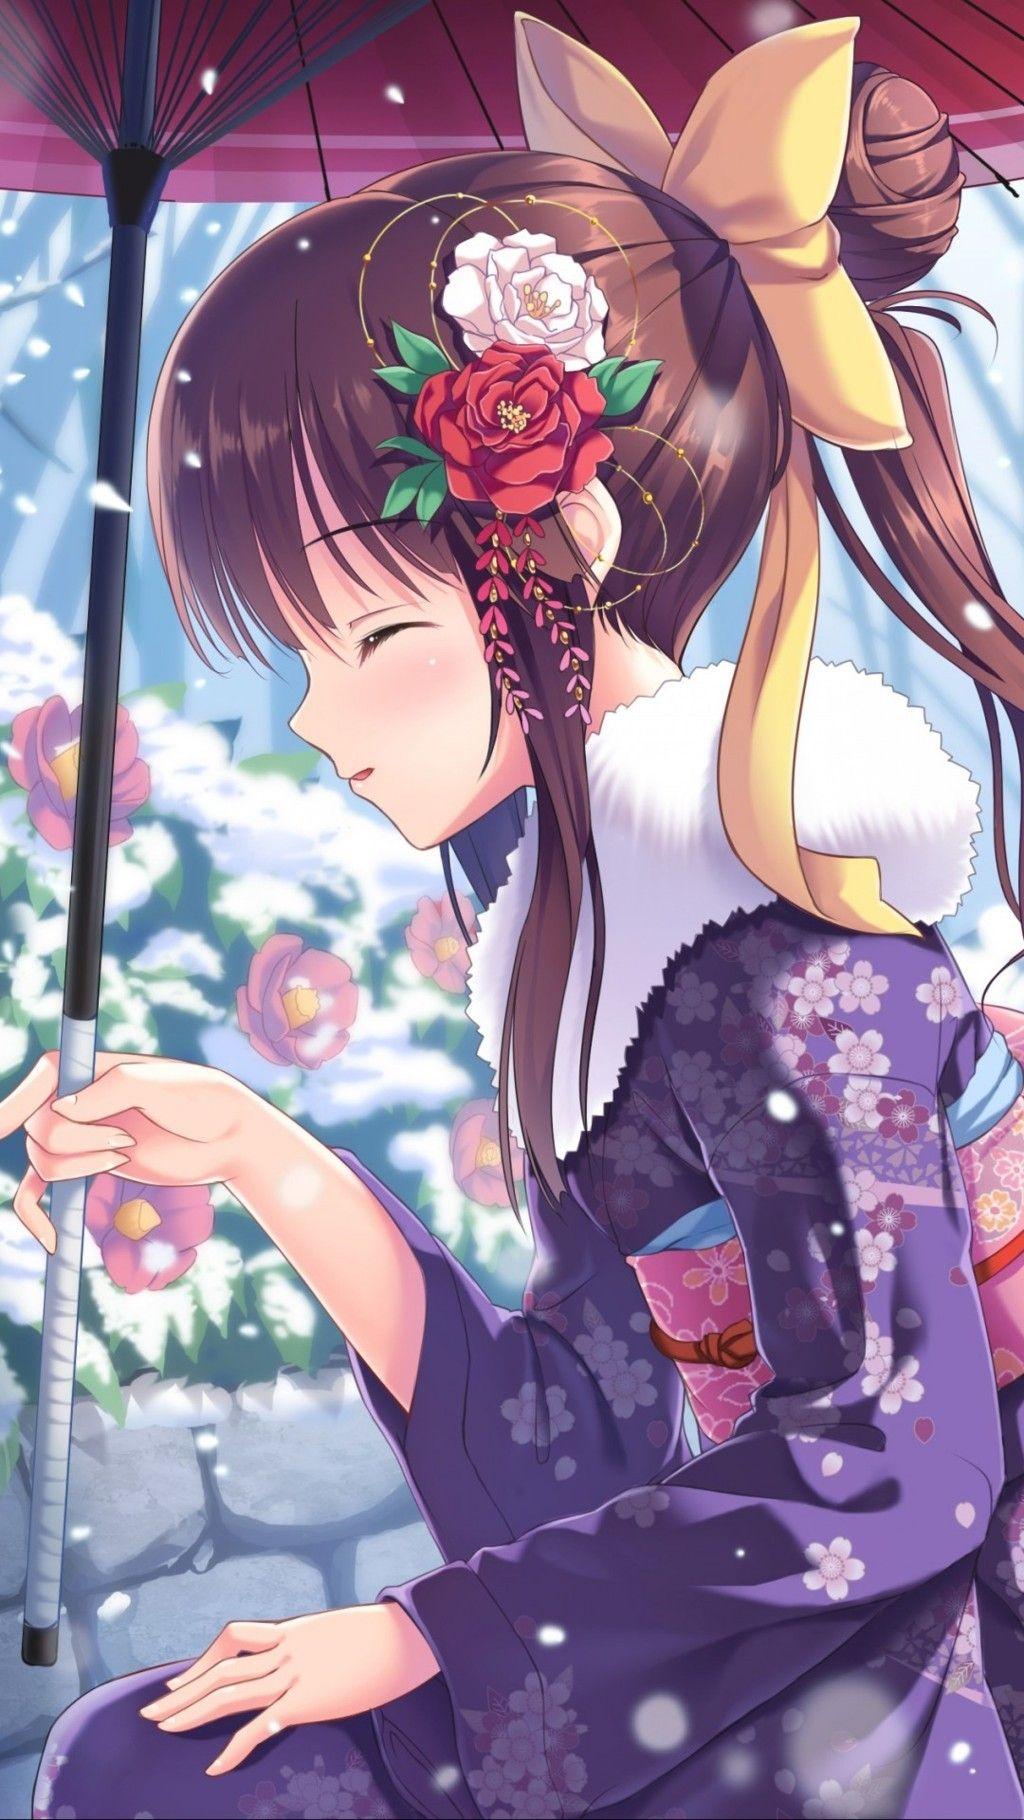 Anime Wallpaper Hd Wallpaper Natal Lucu Kertas Dinding Natal Gambar Anime Anime wallpaper hd ungu